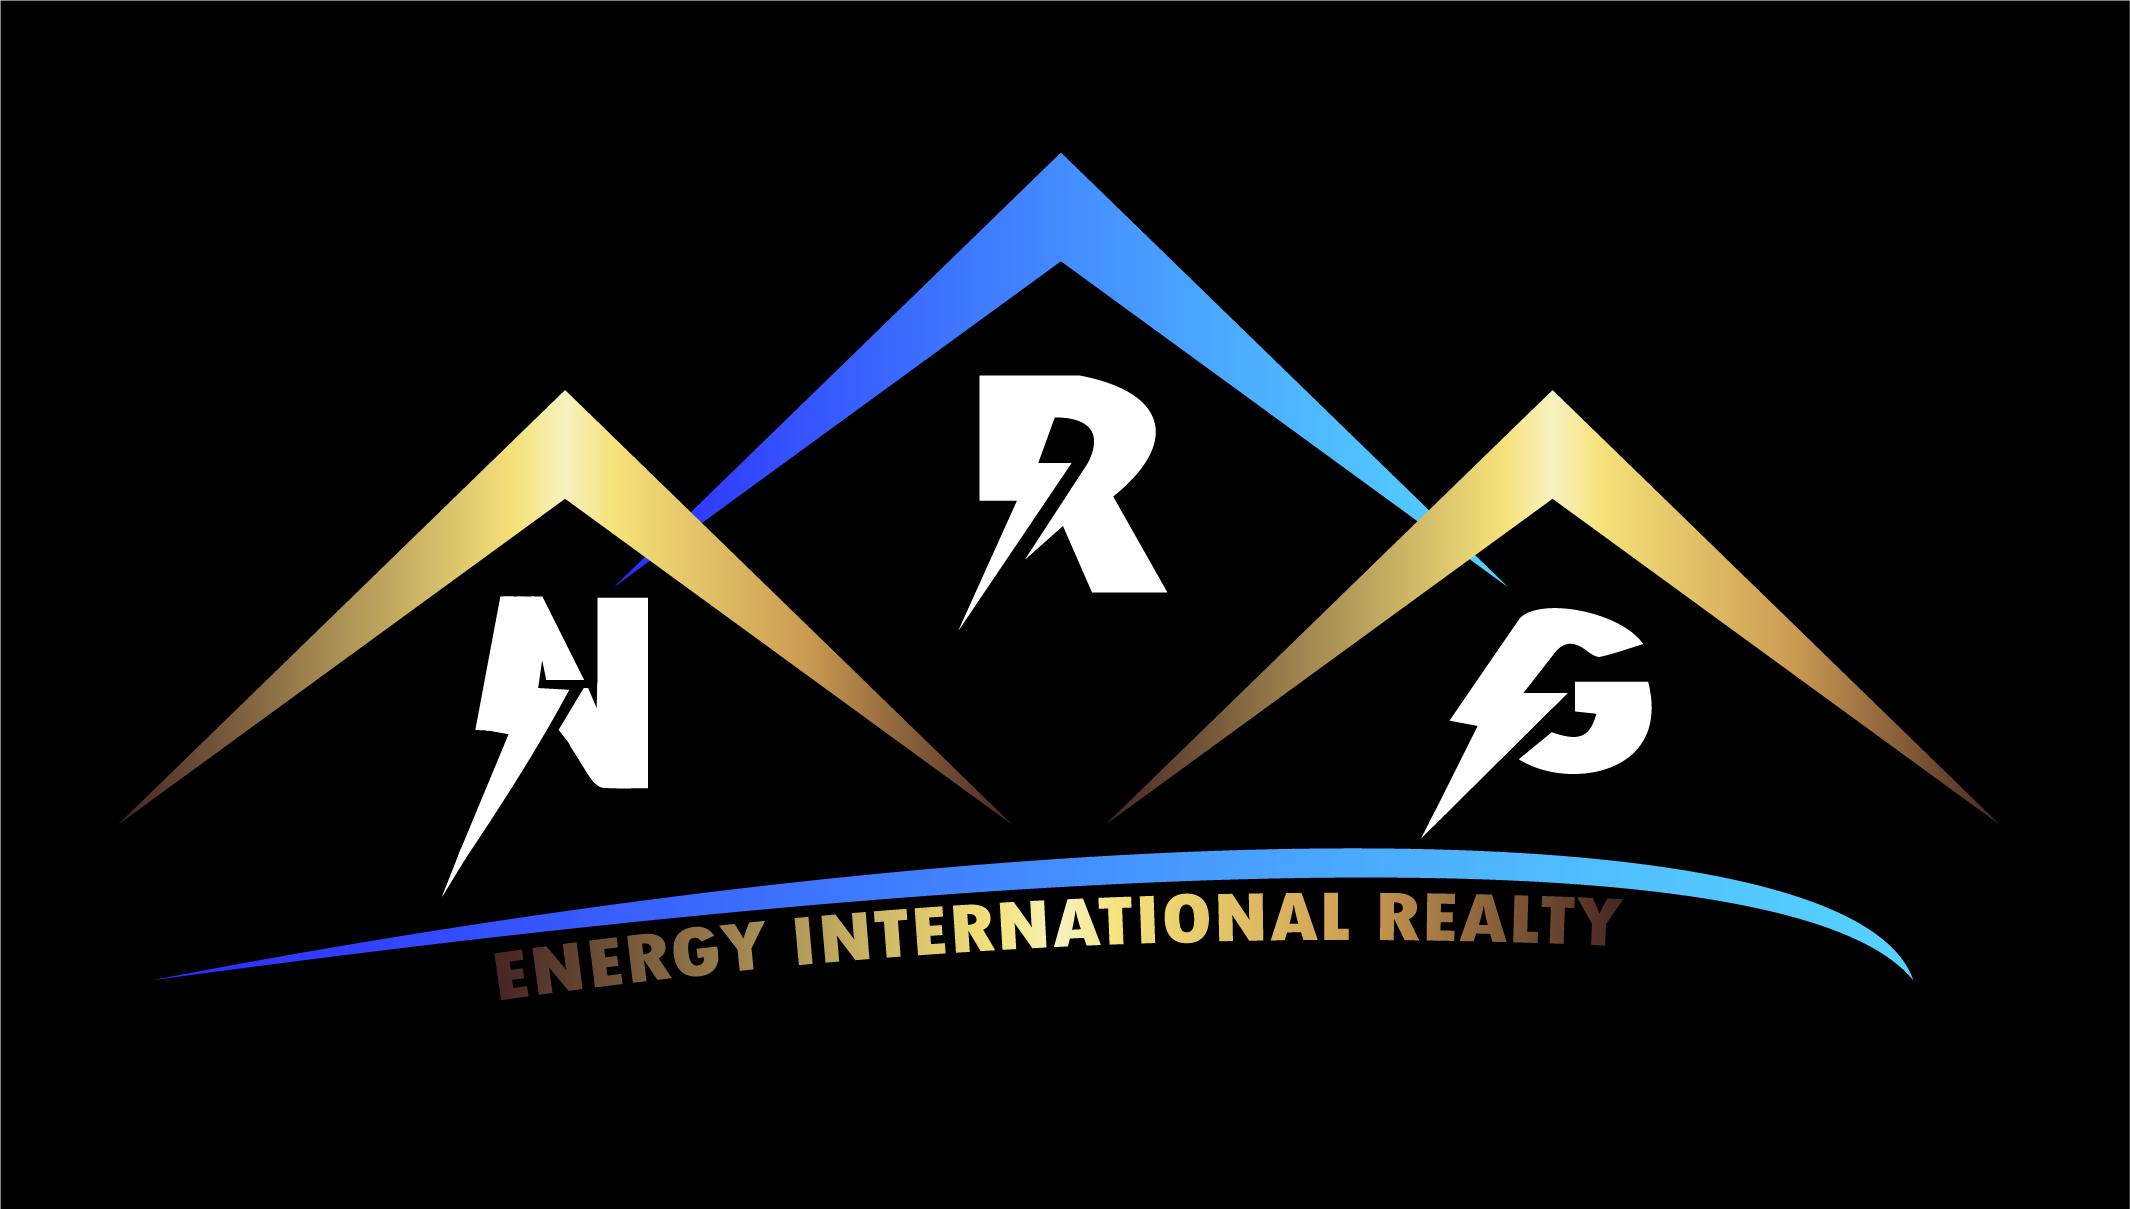 NRG International Realty